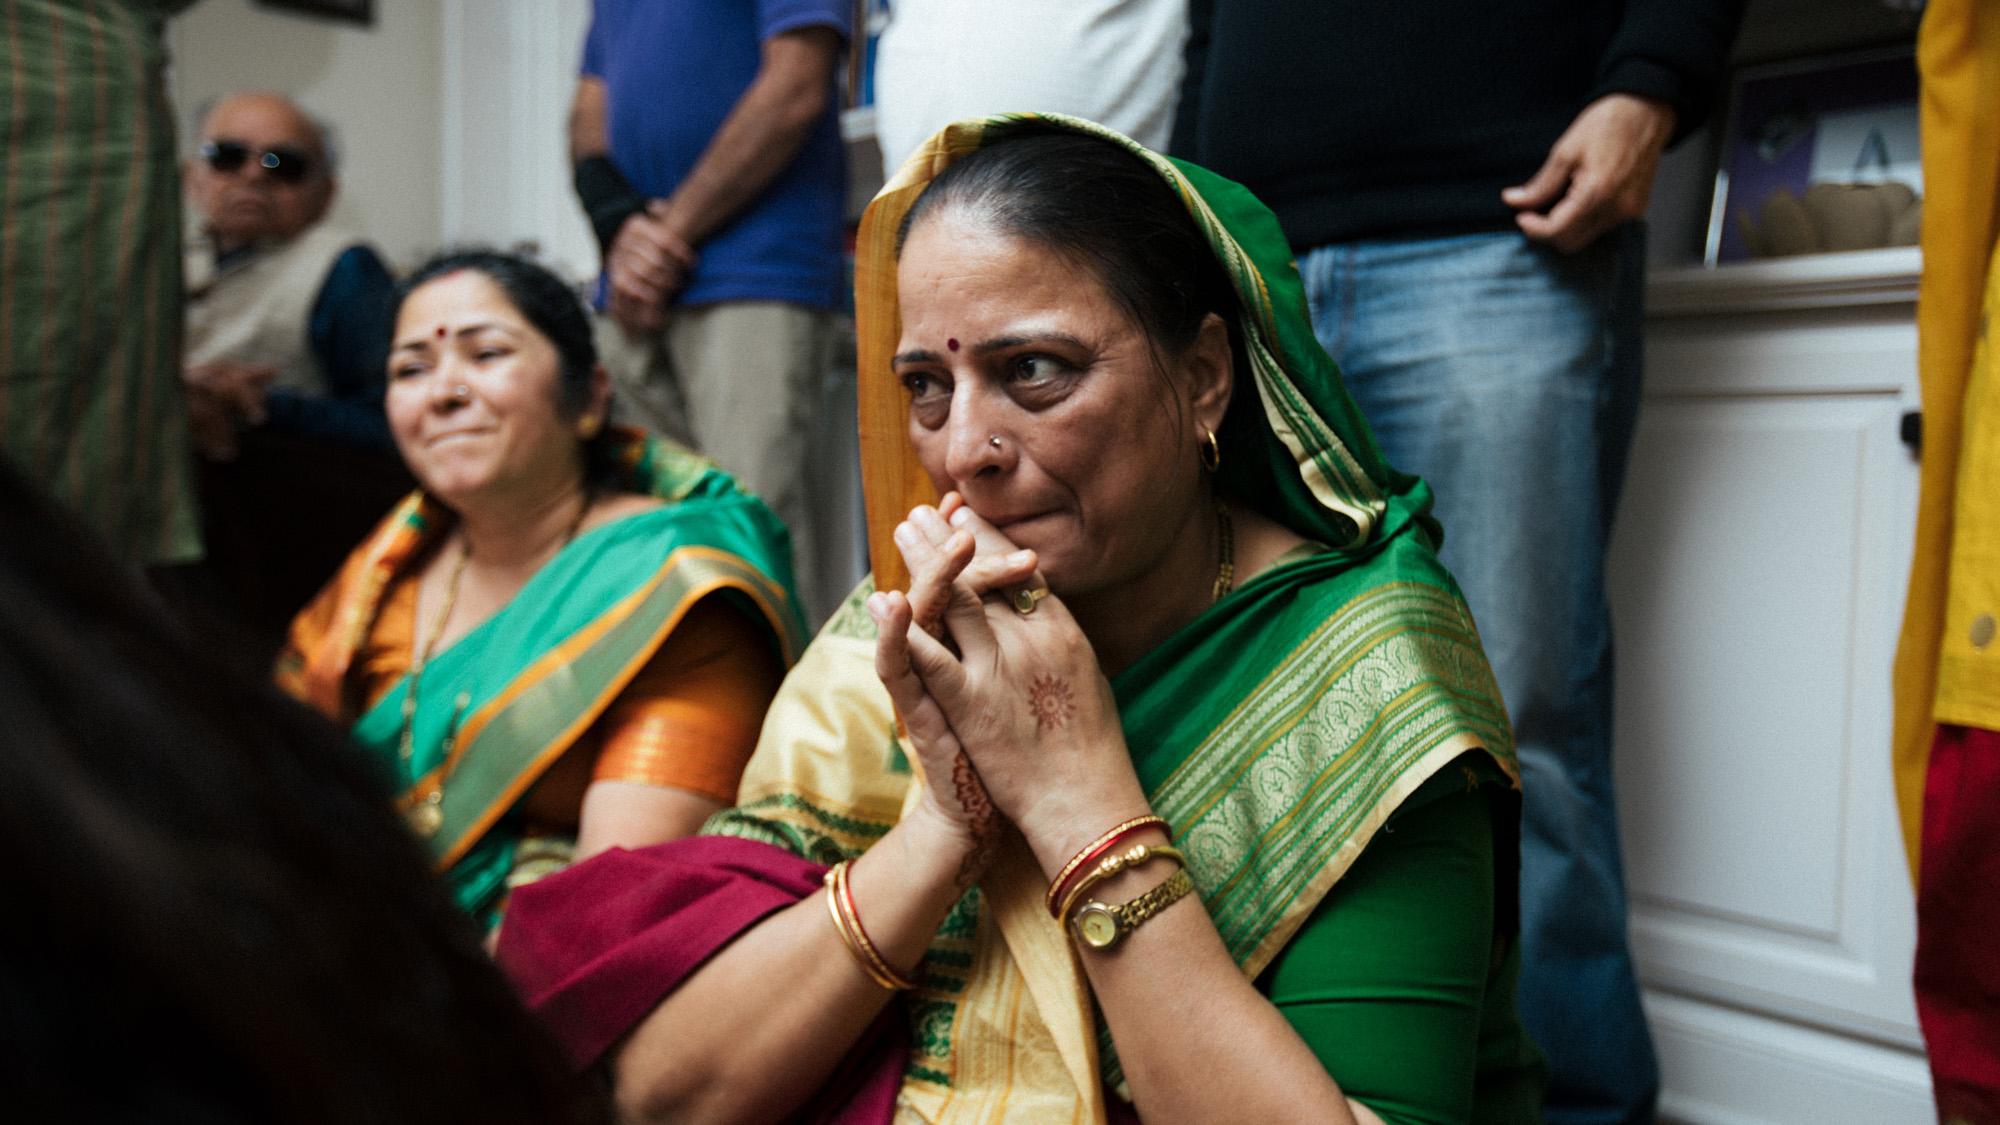 anu_maneesh_alec_vanderboom_Indian_wedding_photography-0193.jpg